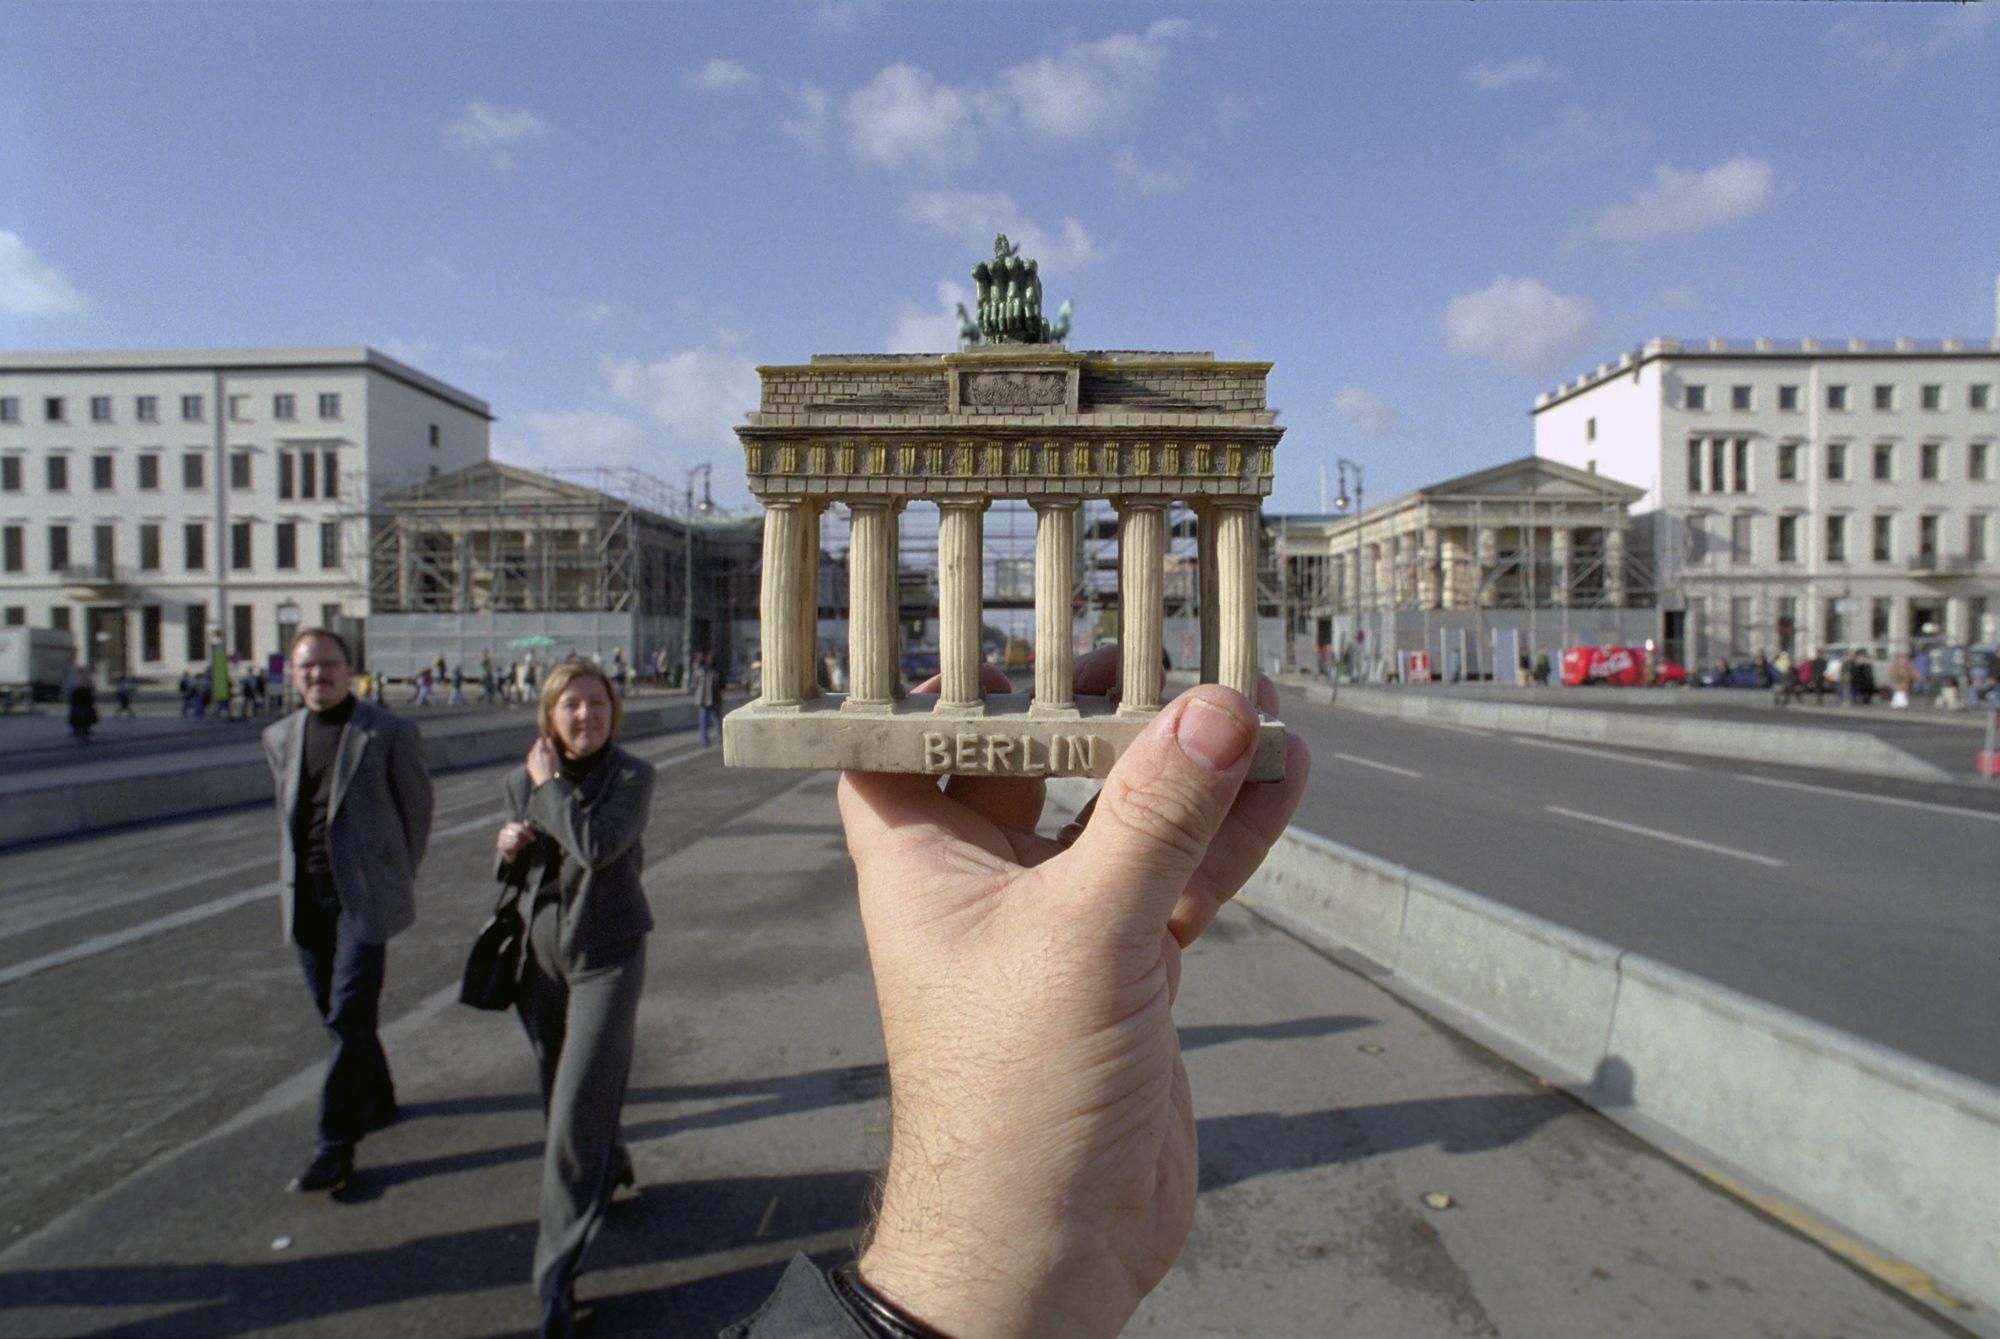 Turm Erlebniscity Oranienburg 2020 All You Need To Know Before You Go With Photos Tripadvisor